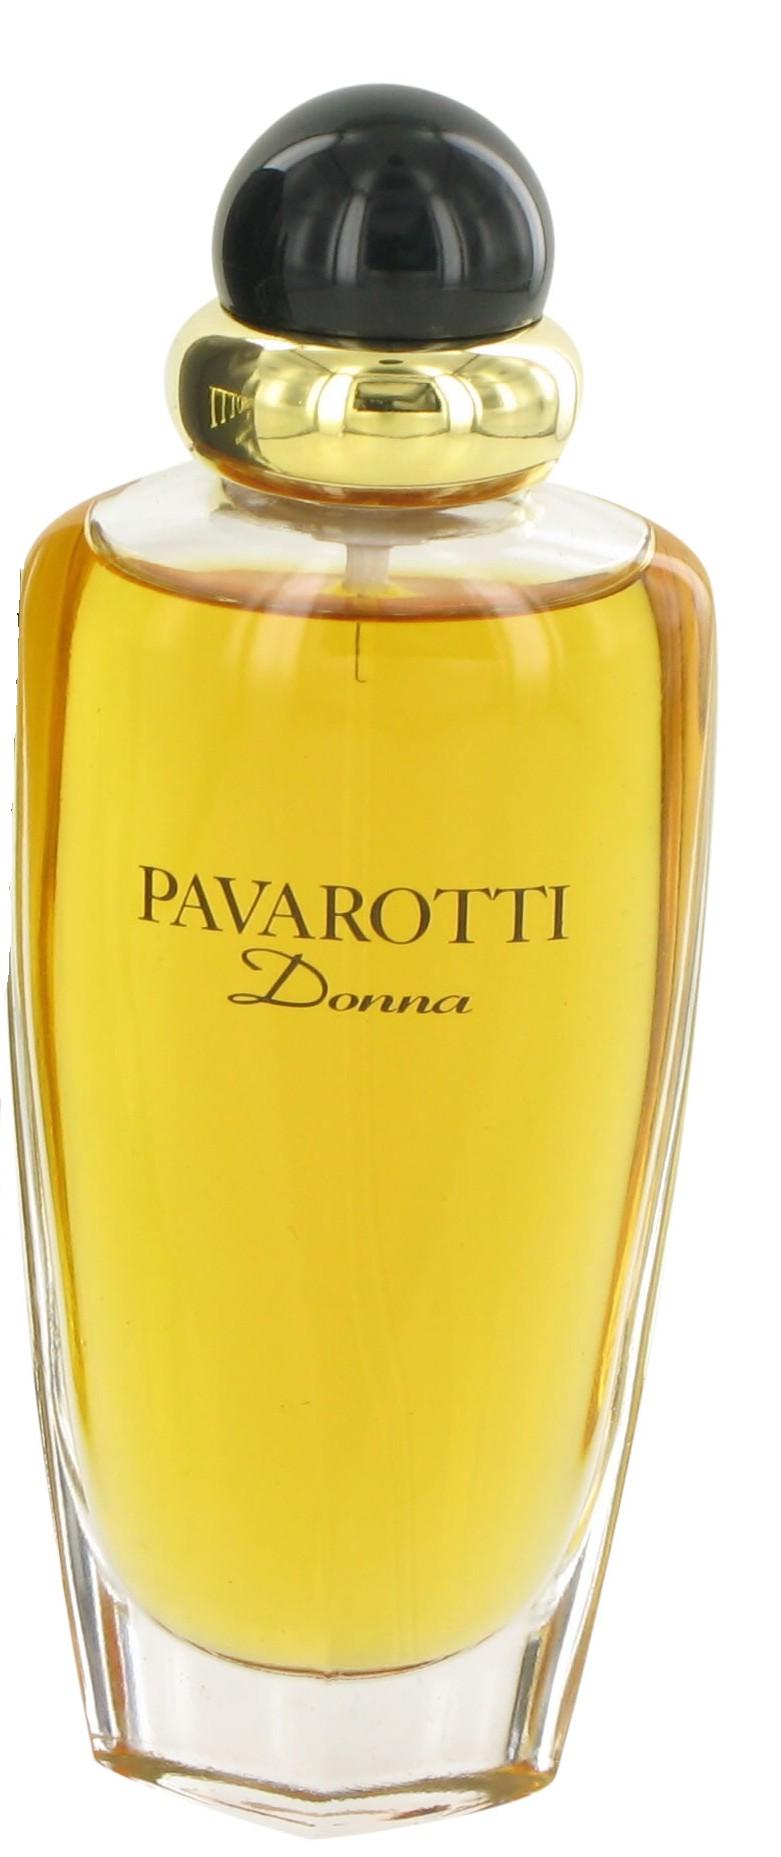 Luciano Pavarotti Pavarotti Donna аромат для женщин